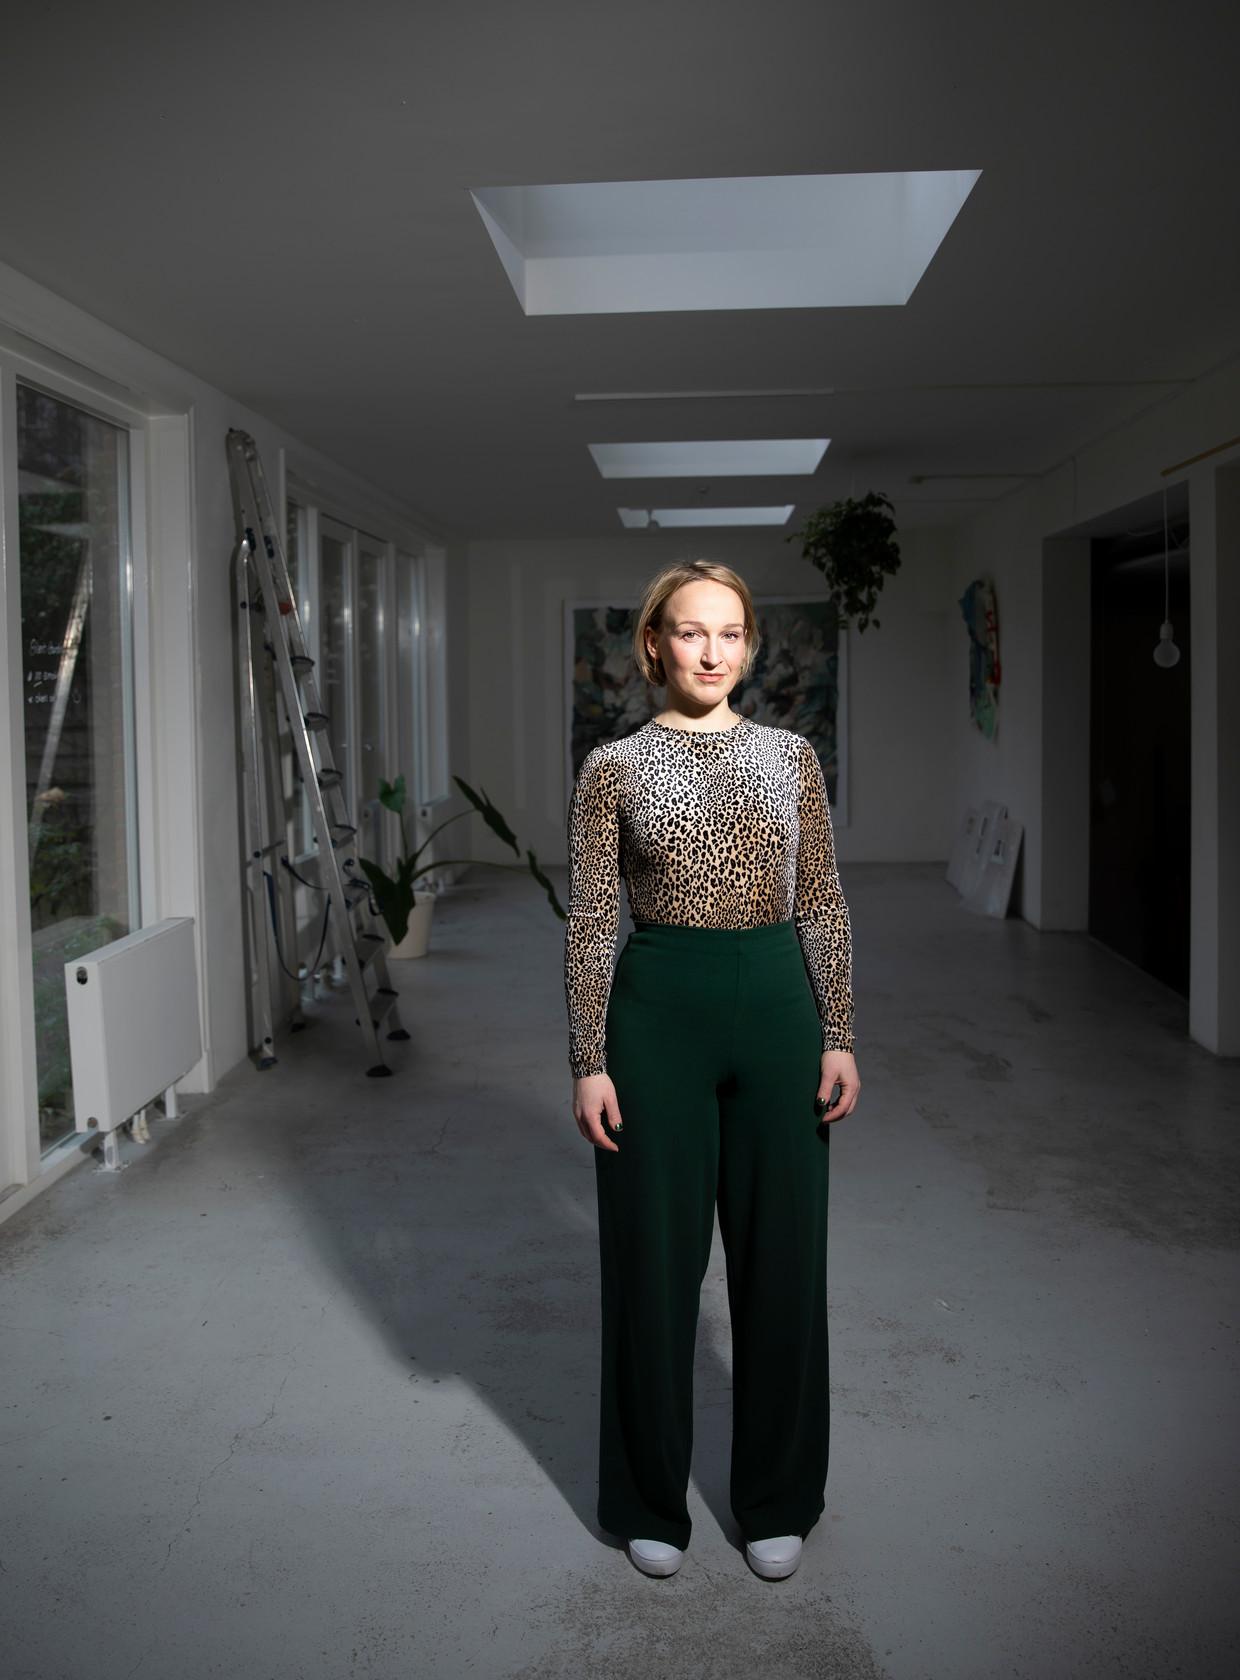 Emmelie Koster, van No man's Art Galerie in Amsterdam. Beeld Judith Jockel